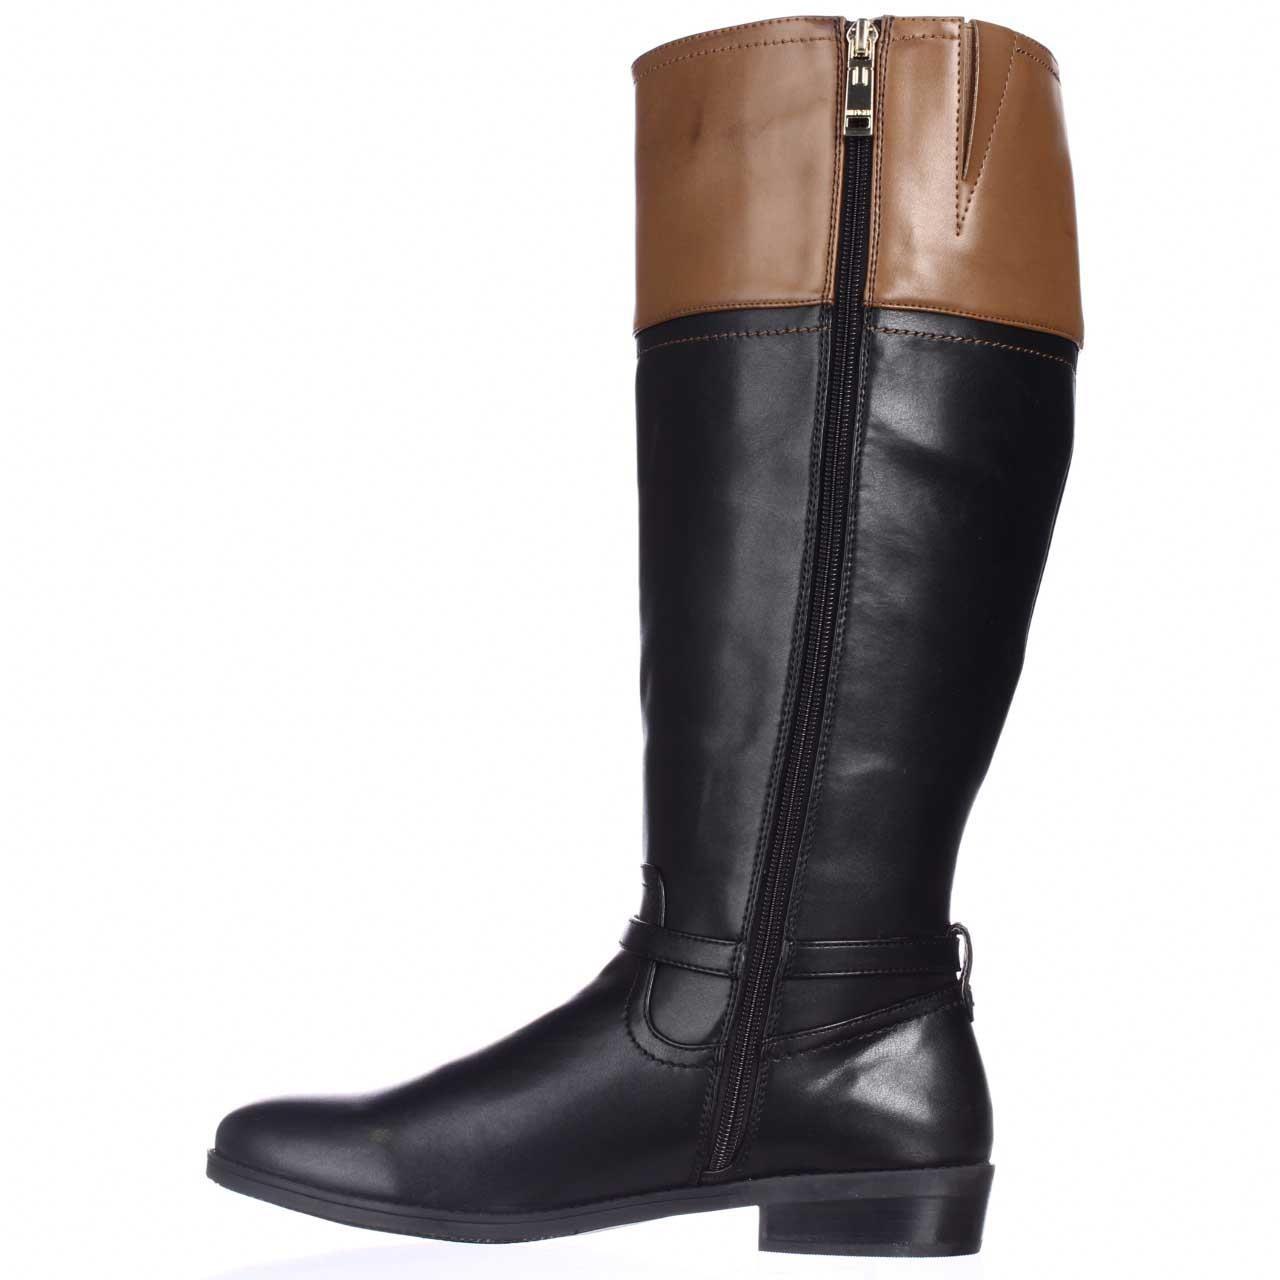 tommy hilfiger drea2 wide calf knee high riding boots in. Black Bedroom Furniture Sets. Home Design Ideas